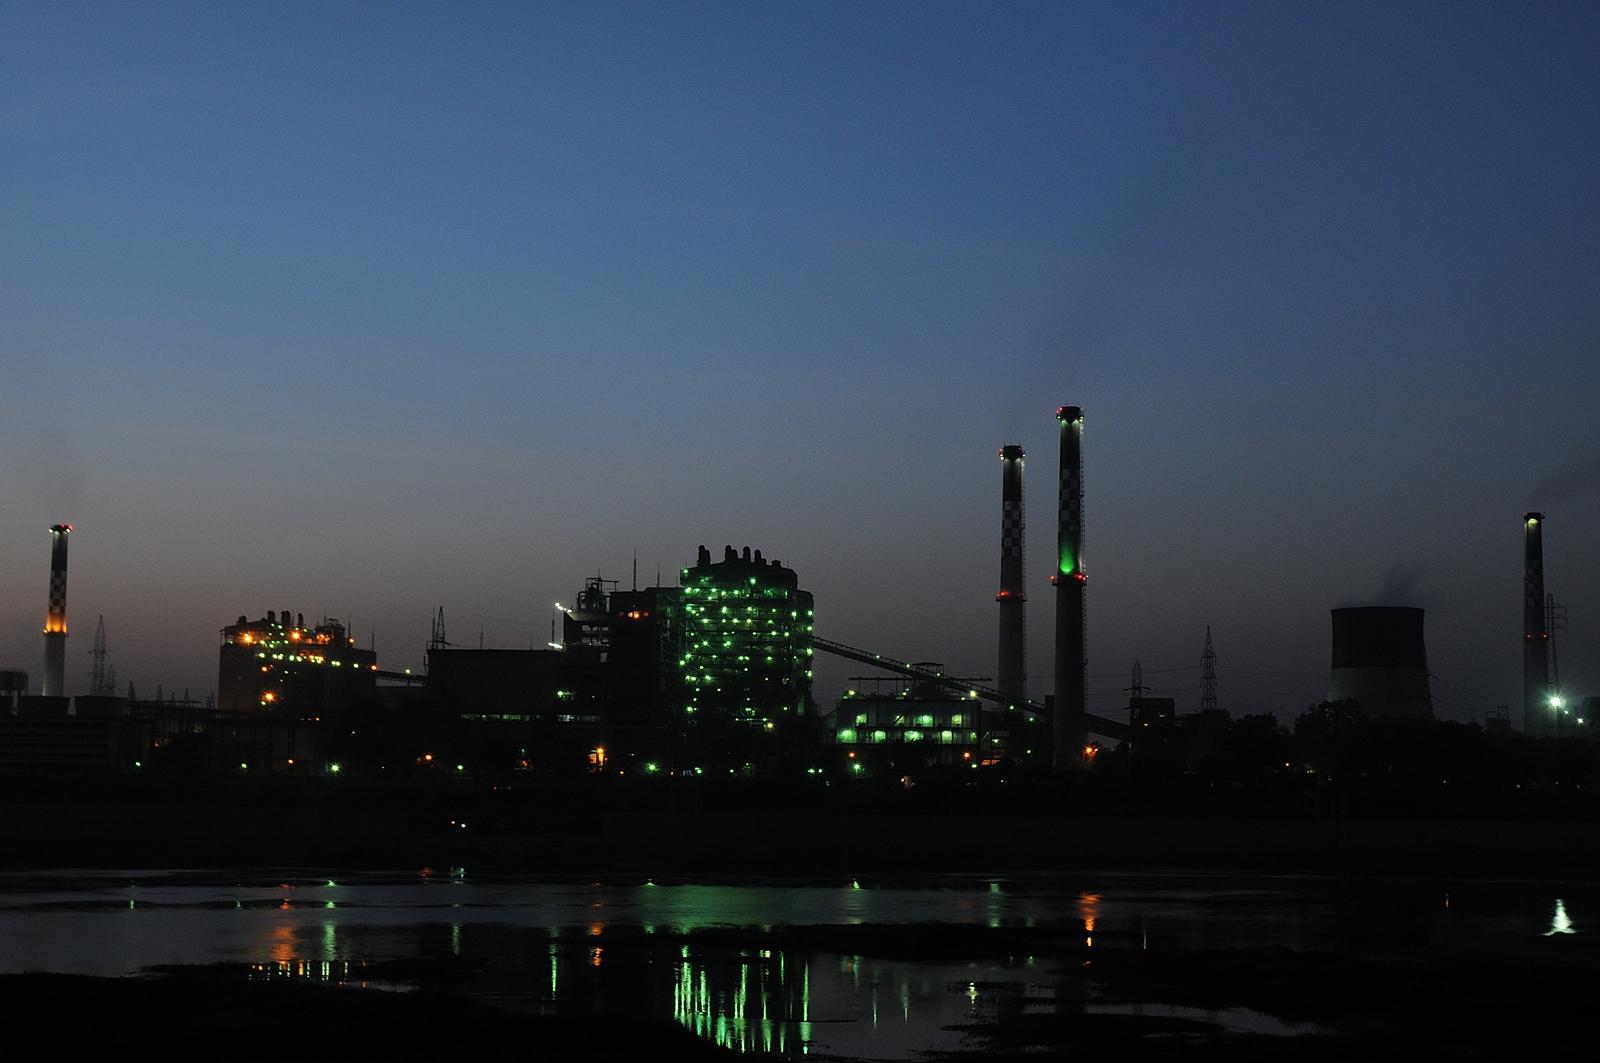 http://upload.wikimedia.org/wikipedia/commons/6/67/Sabarmati_Thermal_Power_Station_%28STPS%29%2C_Ahmedabad.jpg